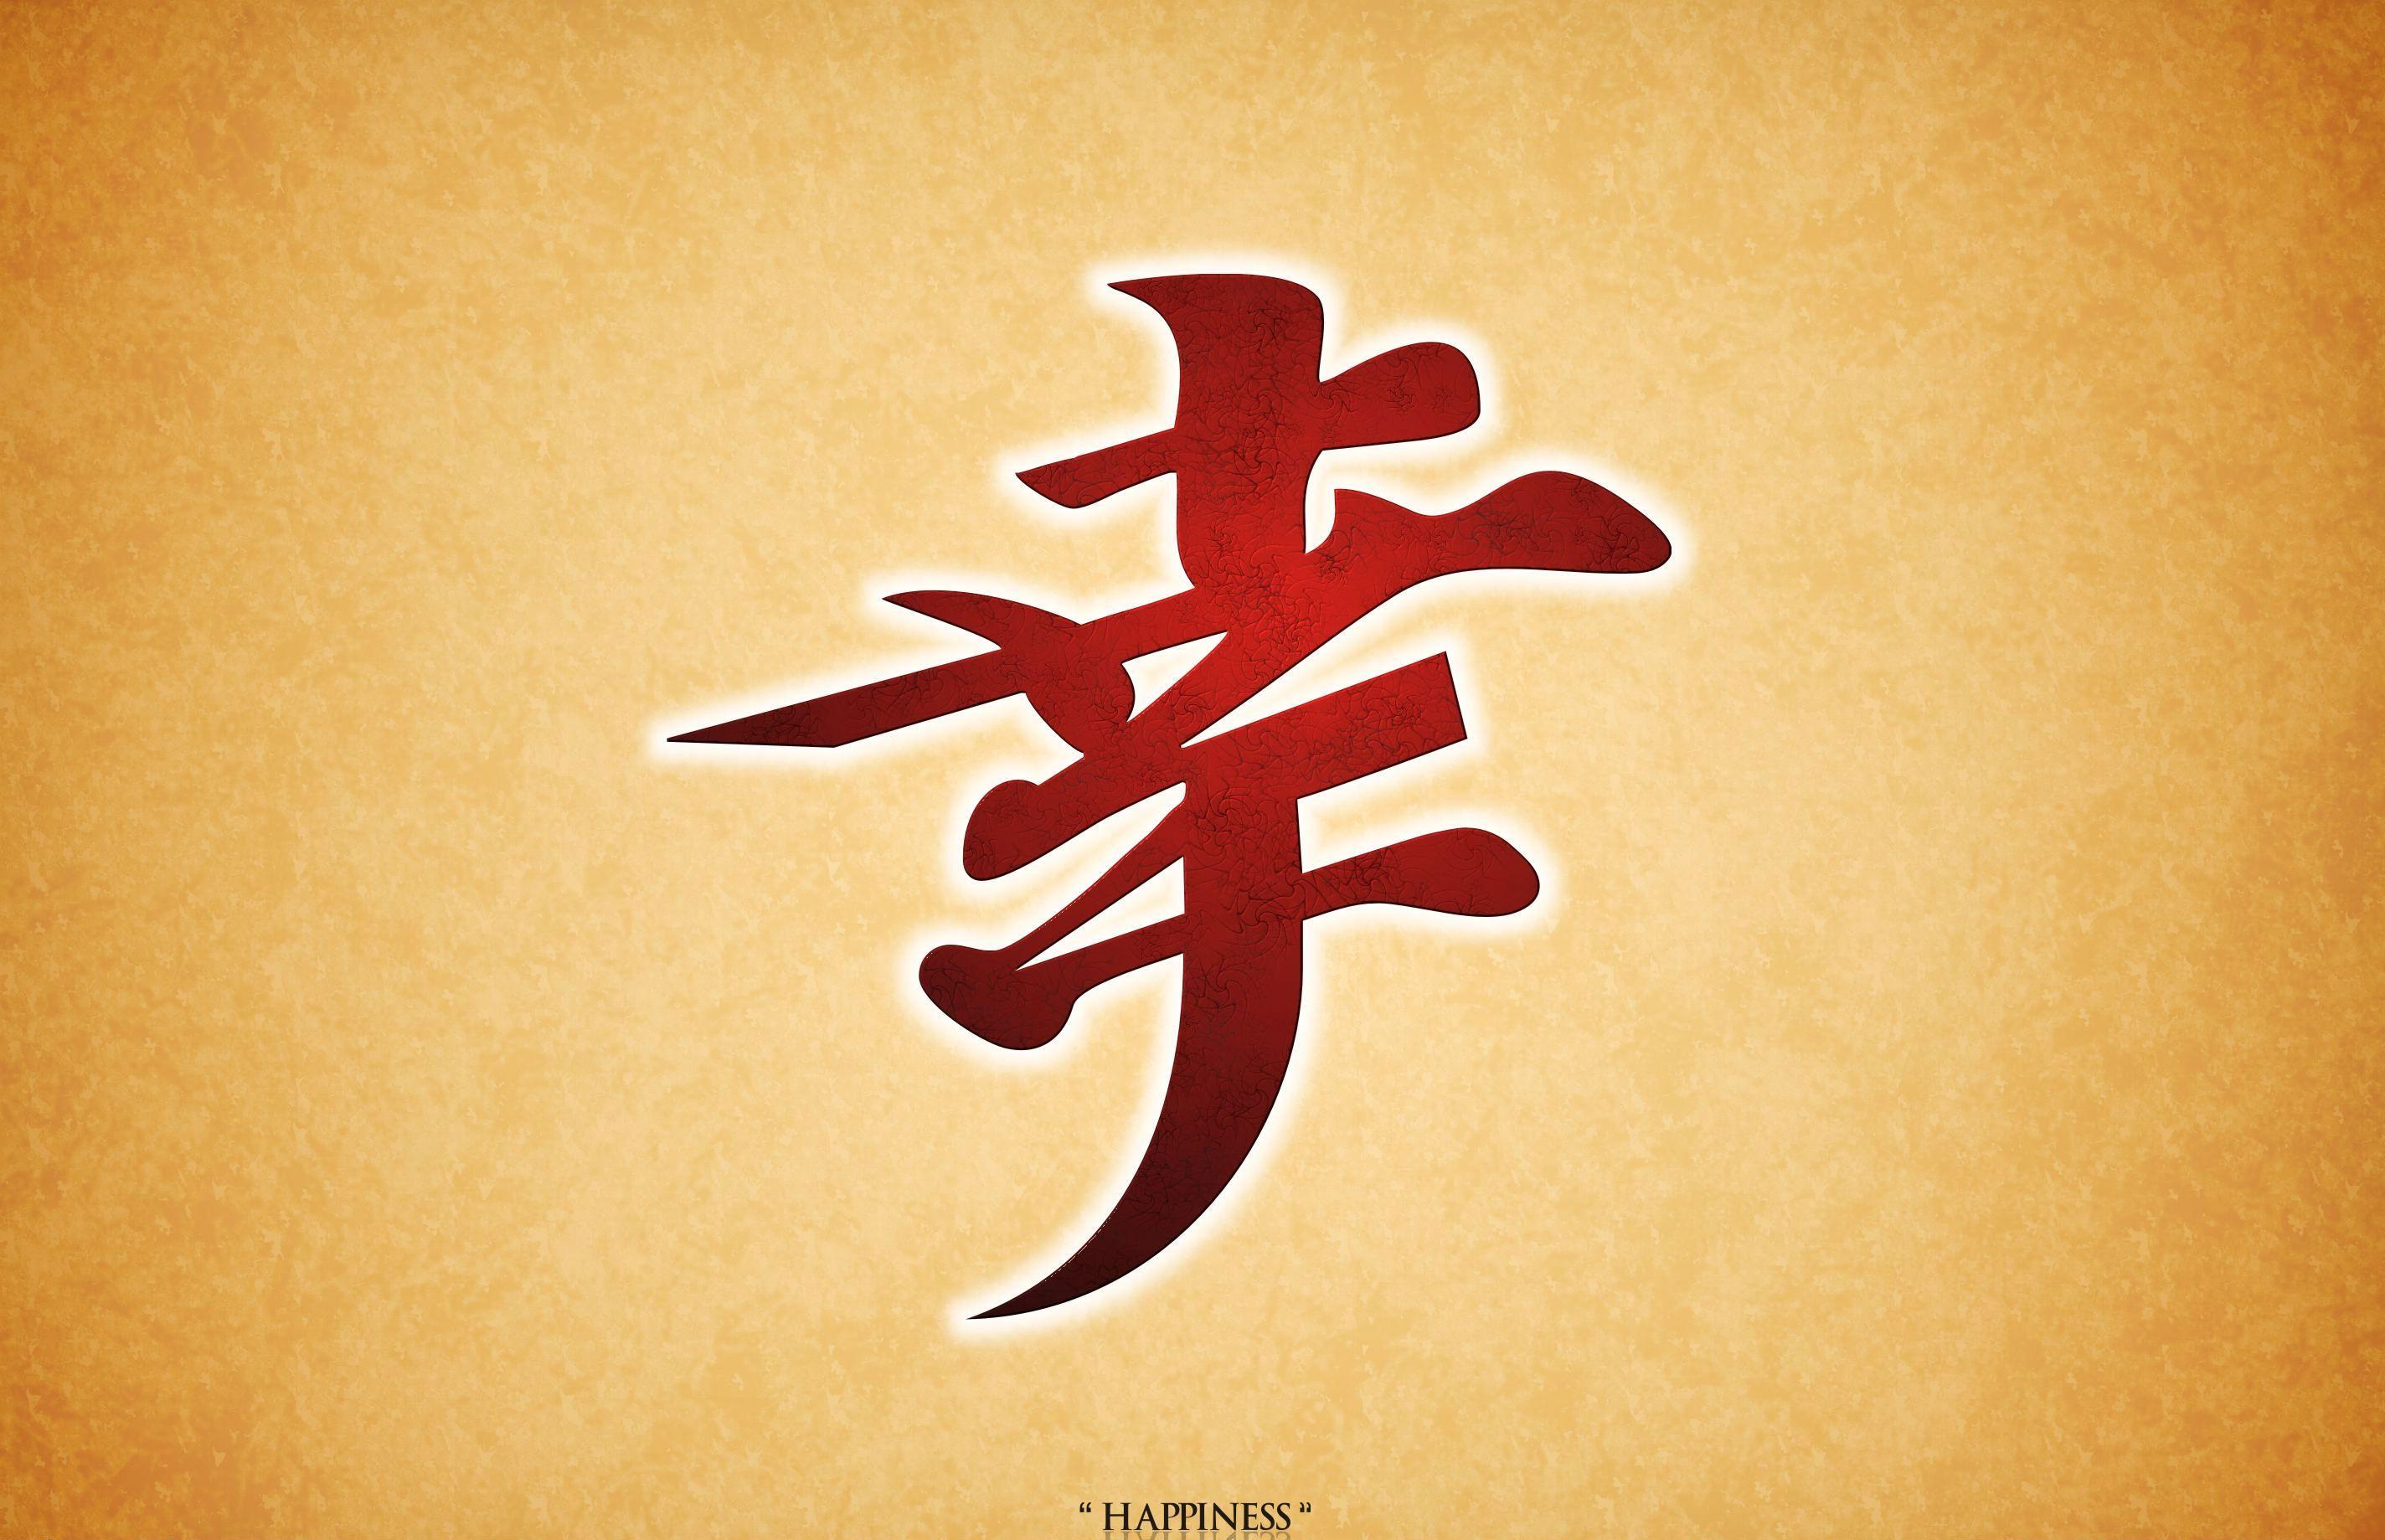 happiness in kanji japanese Computer Wallpapers, Desktop | Images ...